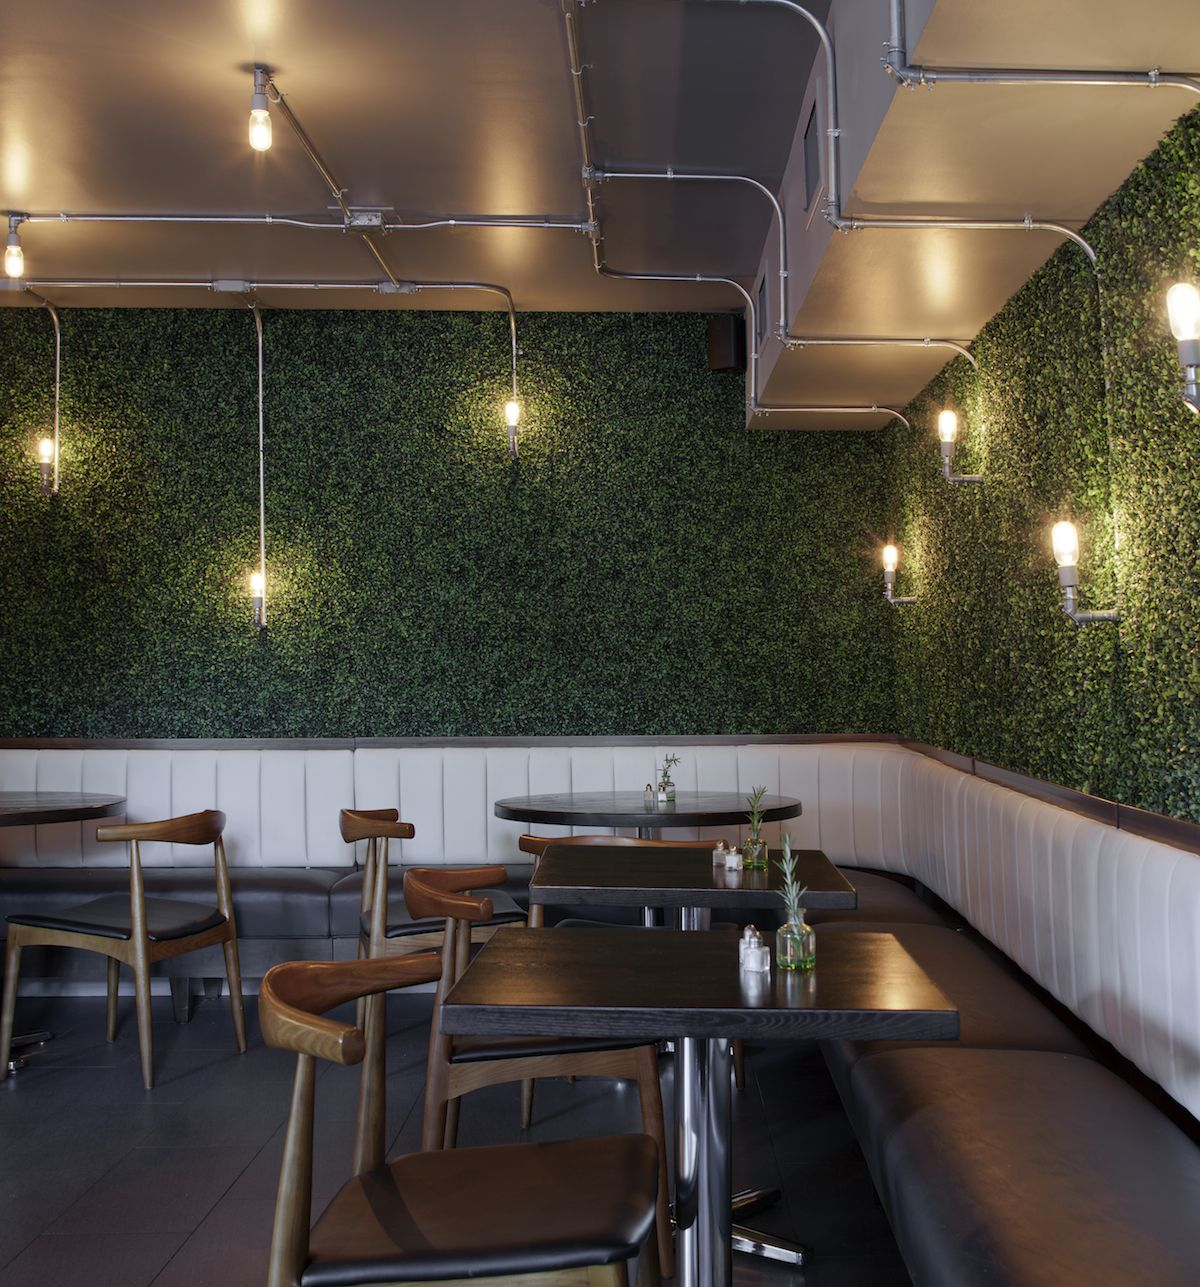 Cafe Banquette Seating: Restaurant Restoration Banquette Seating- Sam Carroll